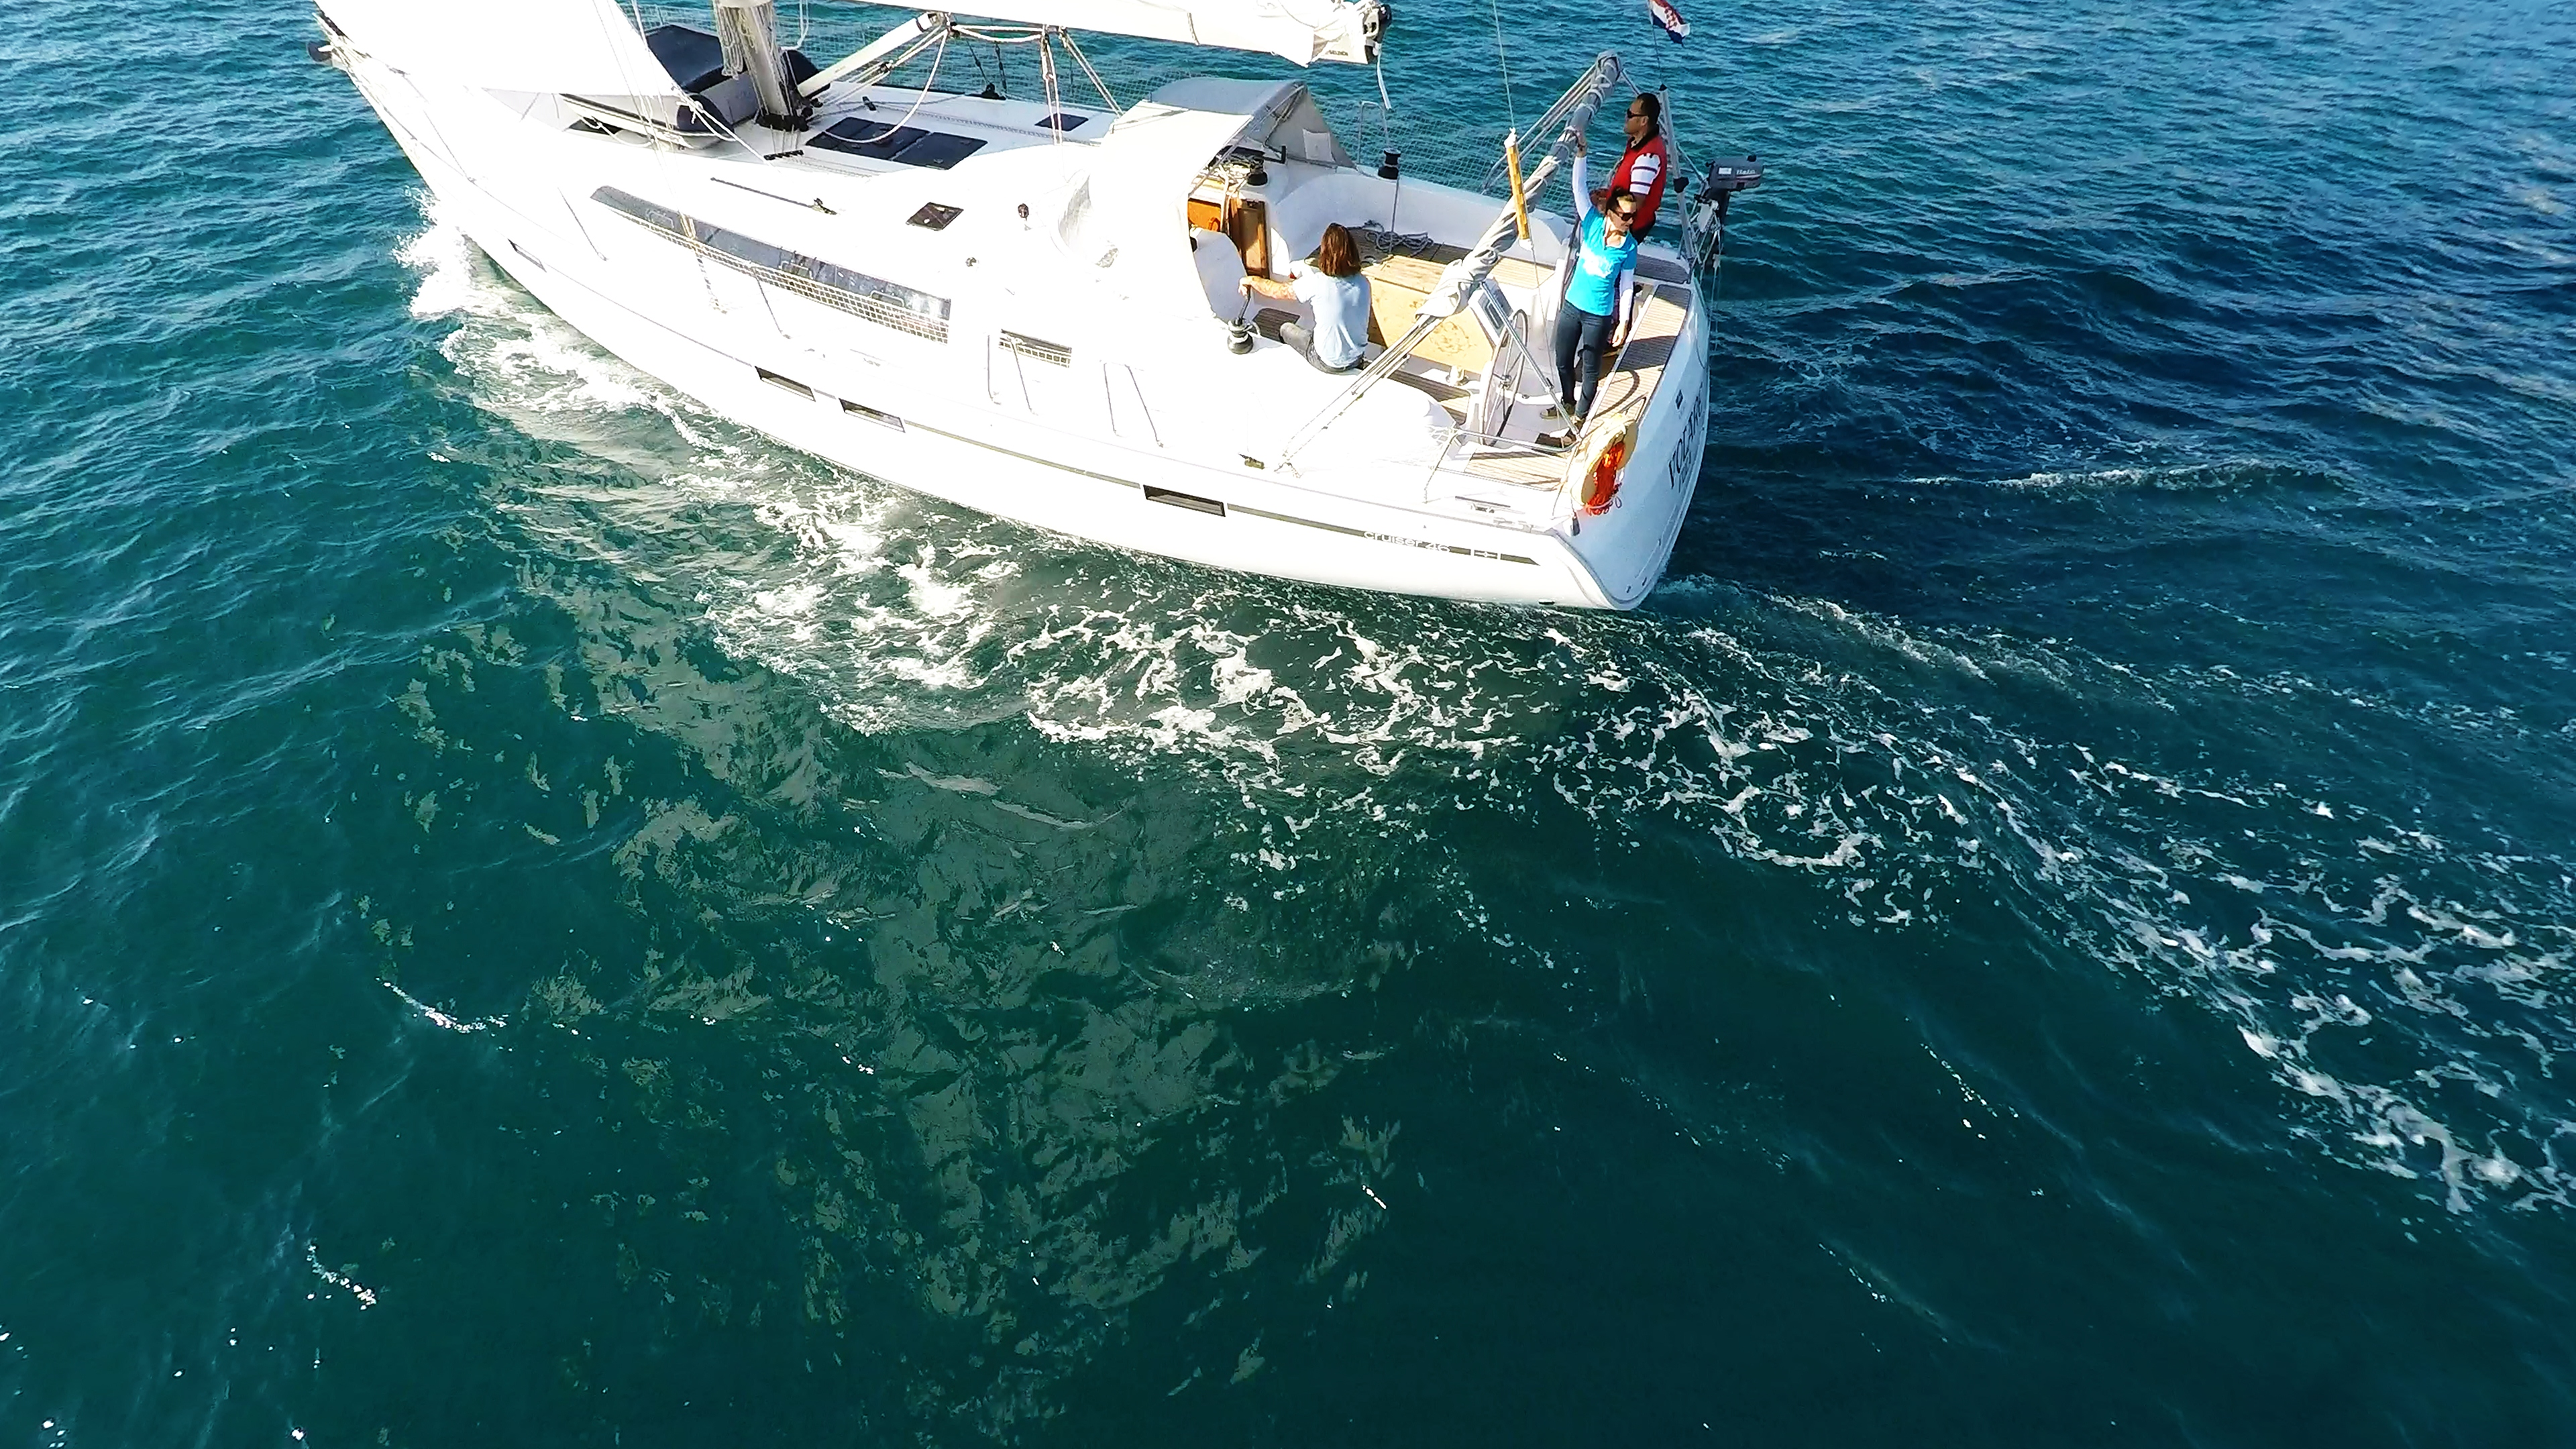 barcha a vela bavaria 46 yacht a vela pozzetto ponte equipaggio